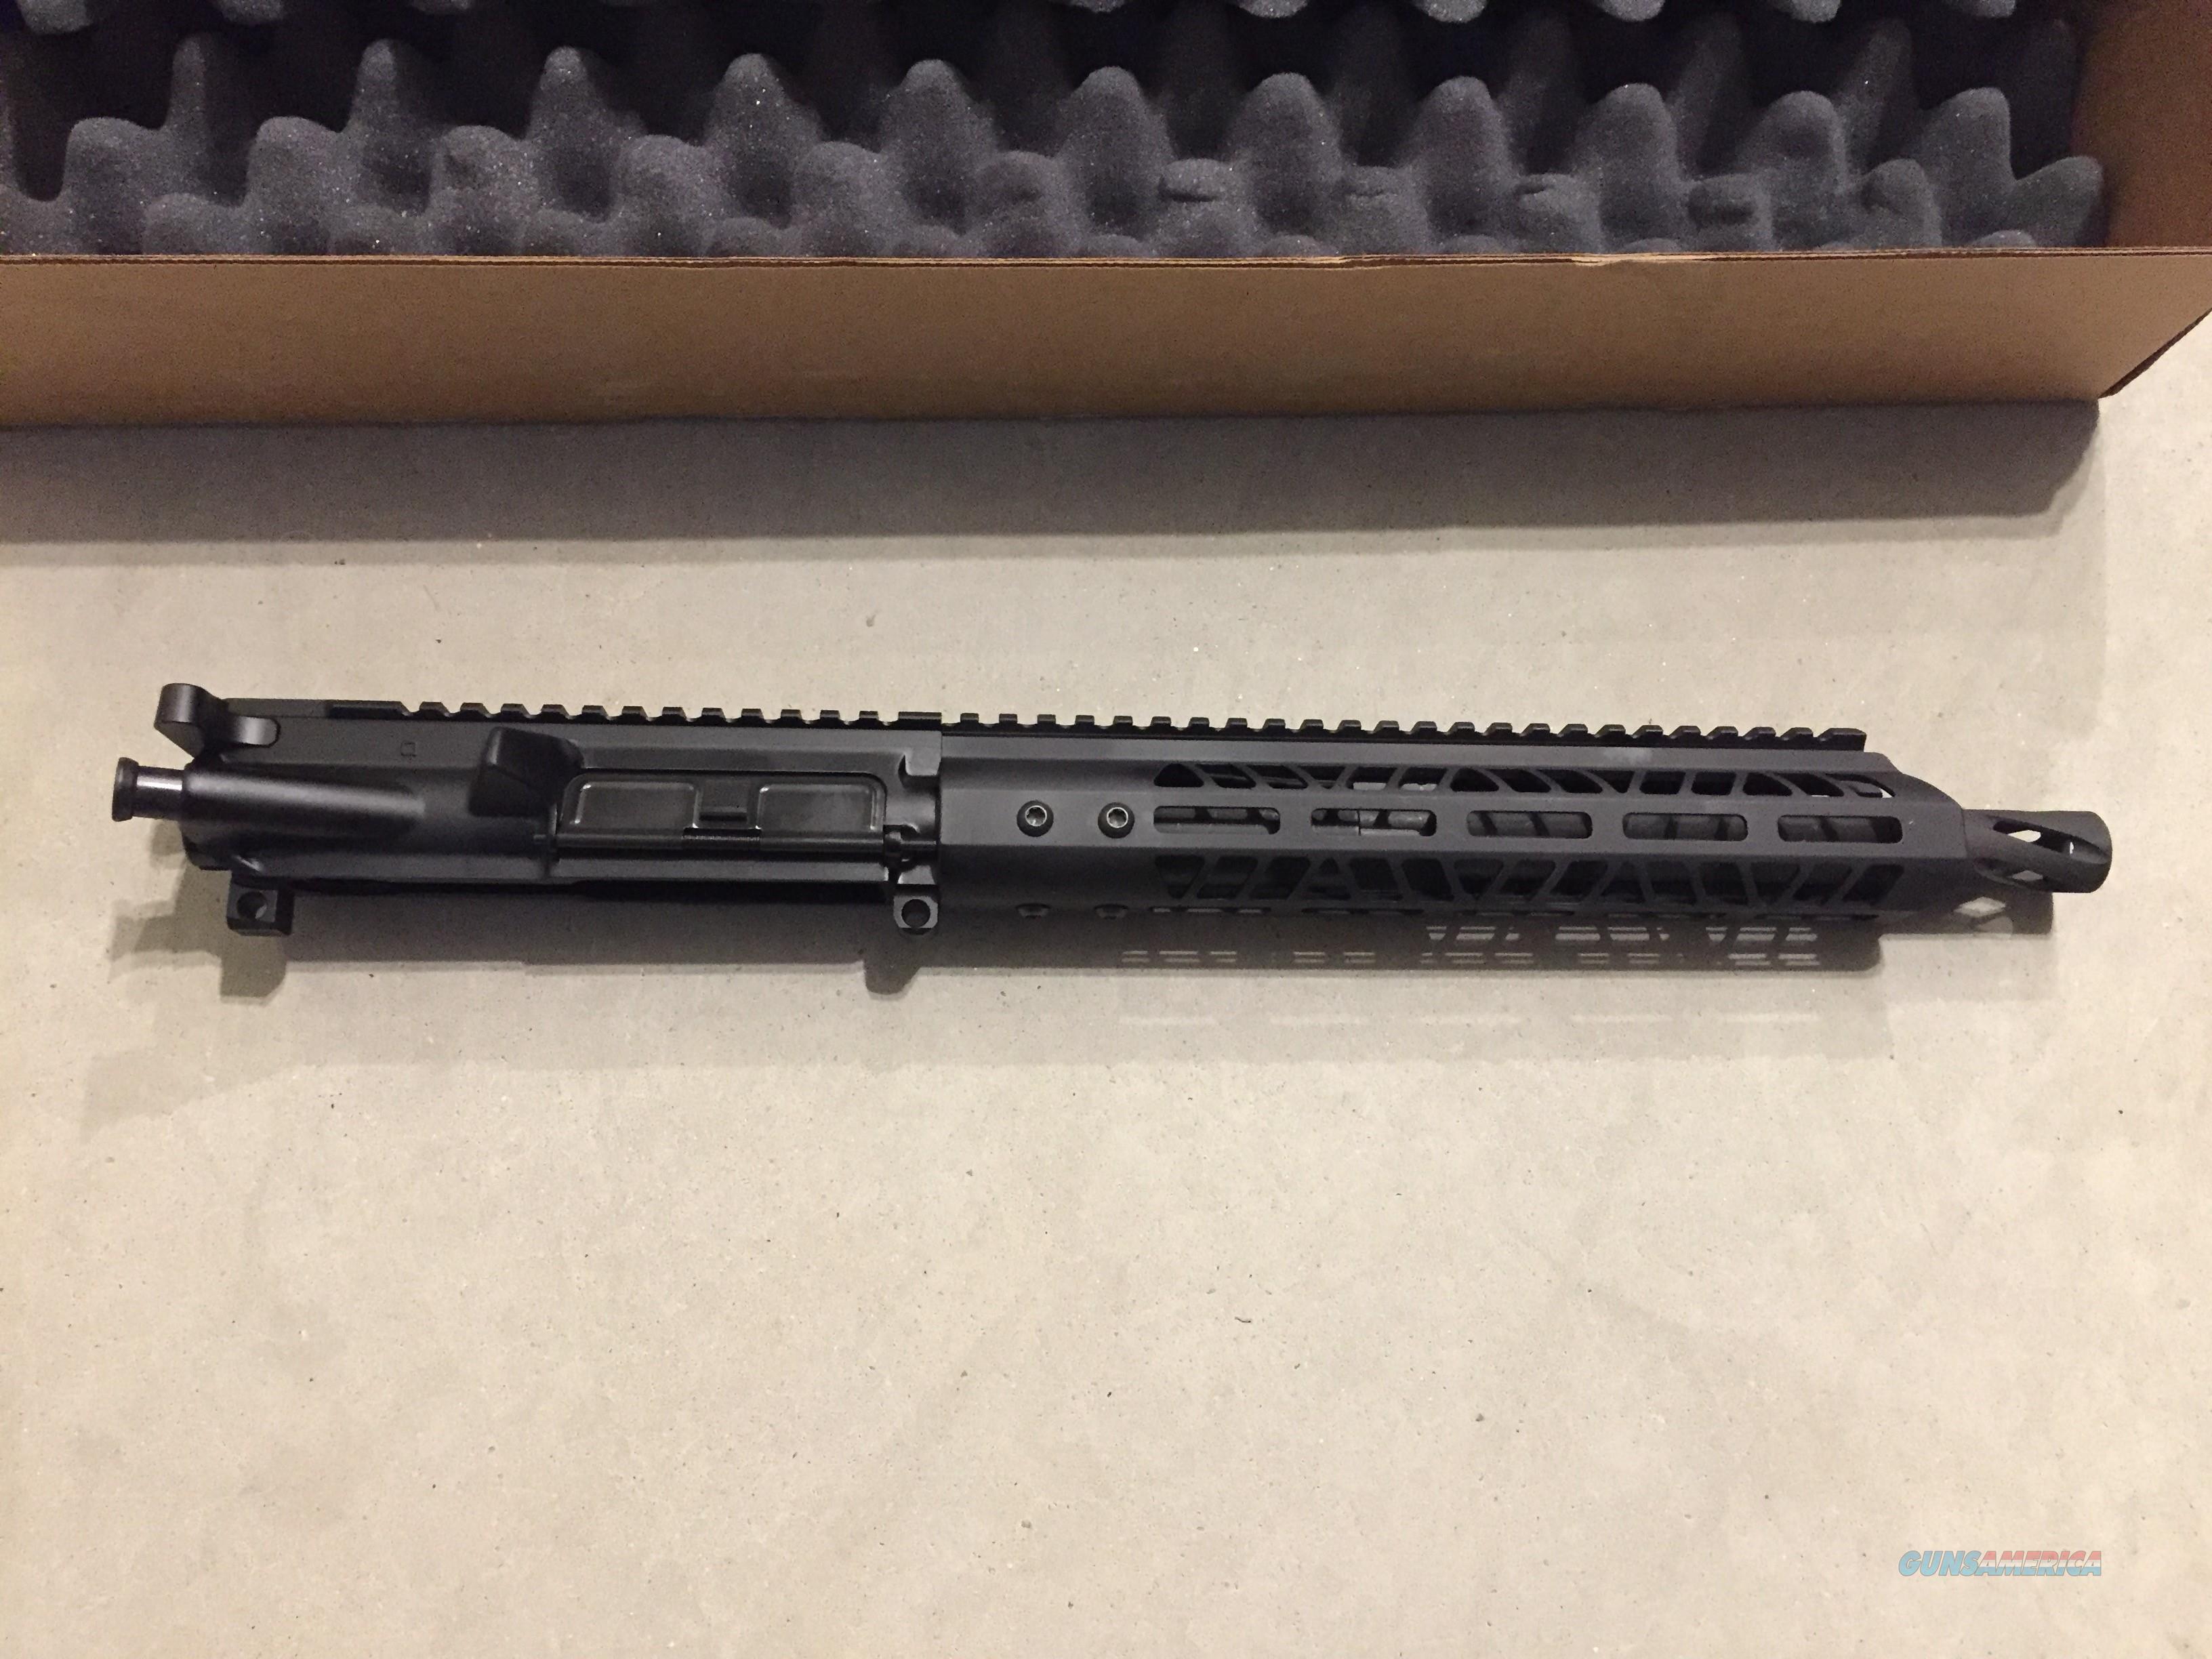 "300 Blackout complete AR15 pistol upper includes (BCA & CH)  AR-15 upper M-LOK 10.5""barrel New in box(No card fees added)  Non-Guns > Gun Parts > M16-AR15 > Upper Only"